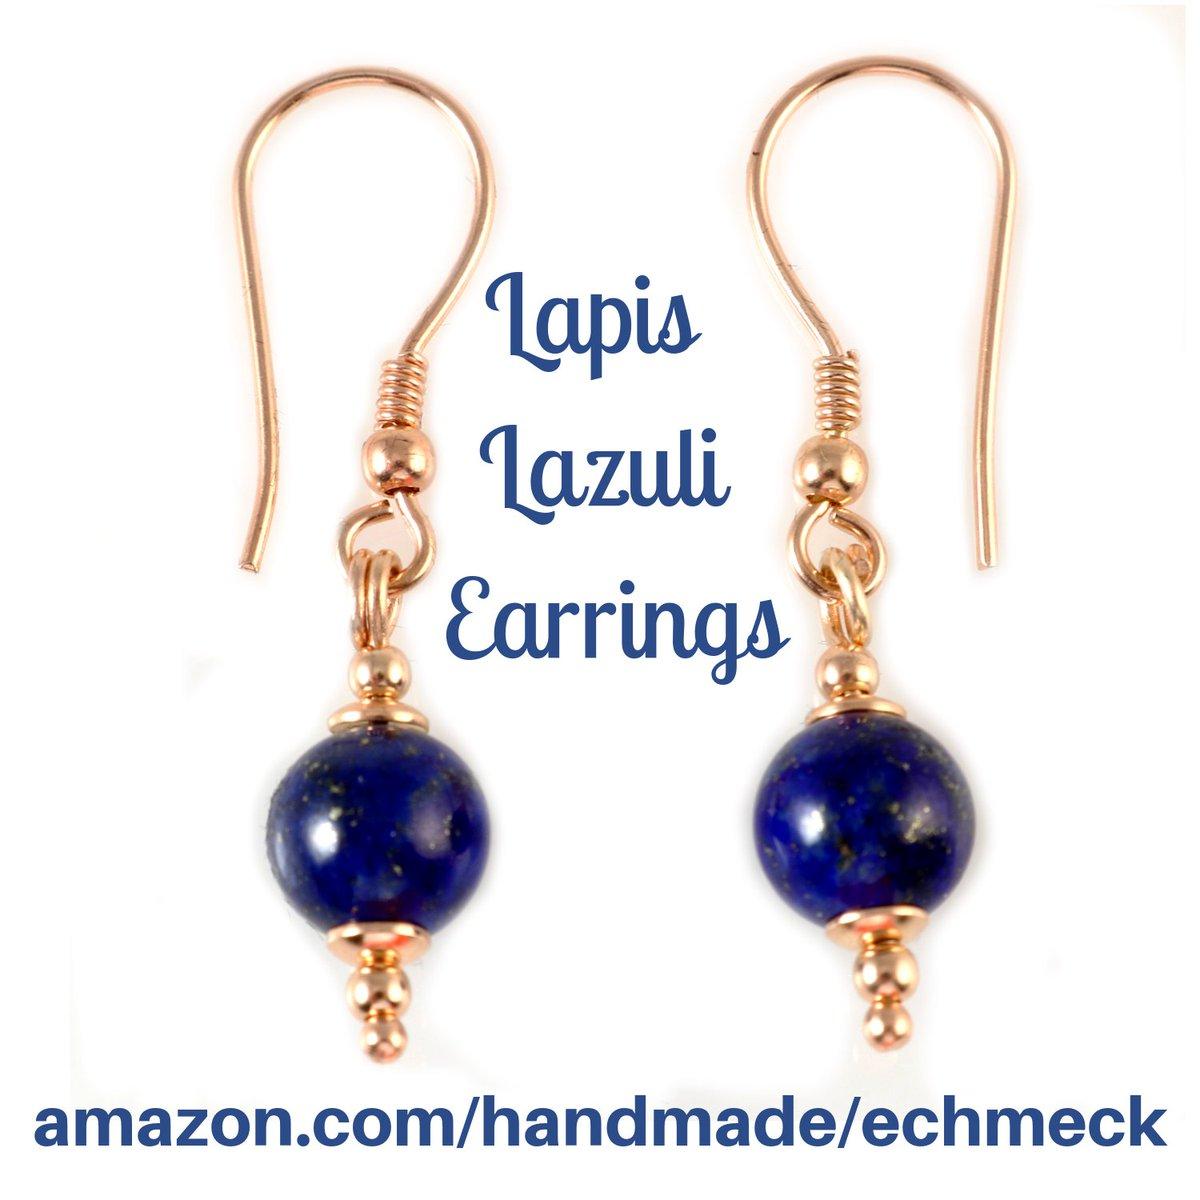 #jewelry #style #gift #fashion #quartz #agate #coral #opal #labradorite #amethyst #lapis #ruby #malachite #Onyx #sapphire #emerald #carnelian #moonstone #pearl #jade #gemstone #gems #gemstones #lava #turquoise #silver